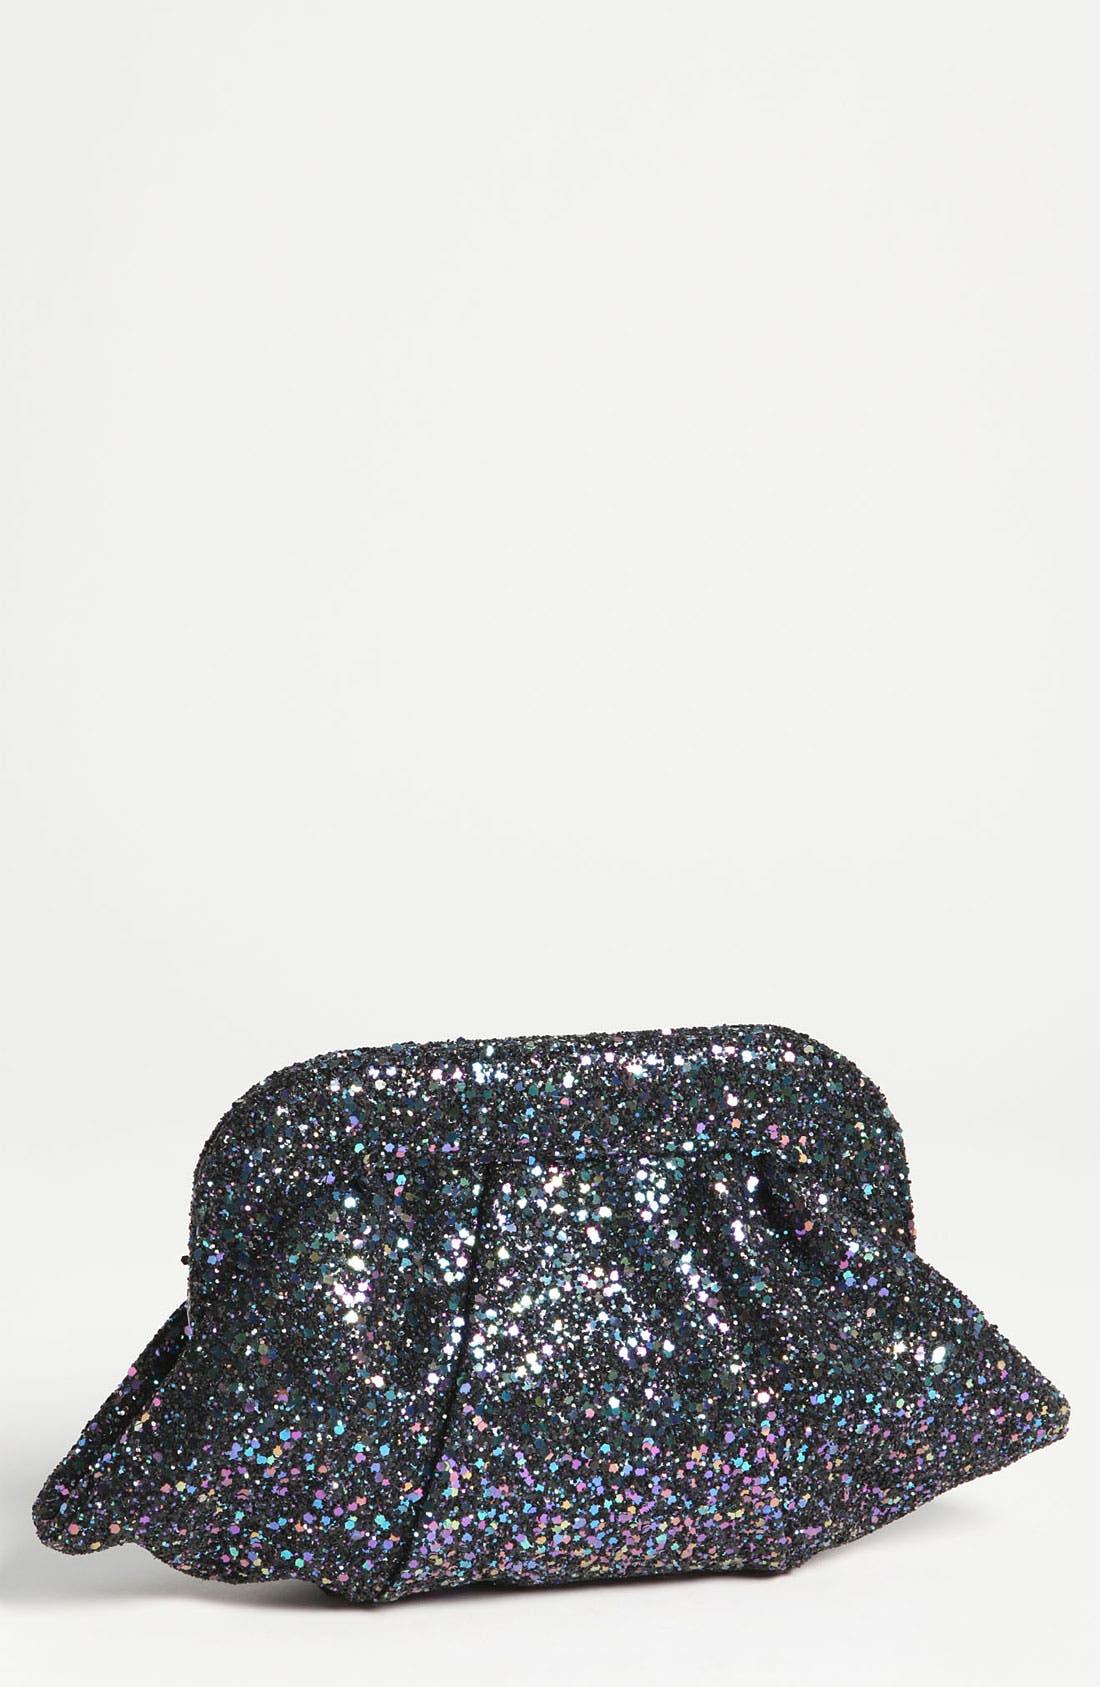 Alternate Image 1 Selected - Lauren Merkin 'Lucy' Glitter Encrusted Clutch